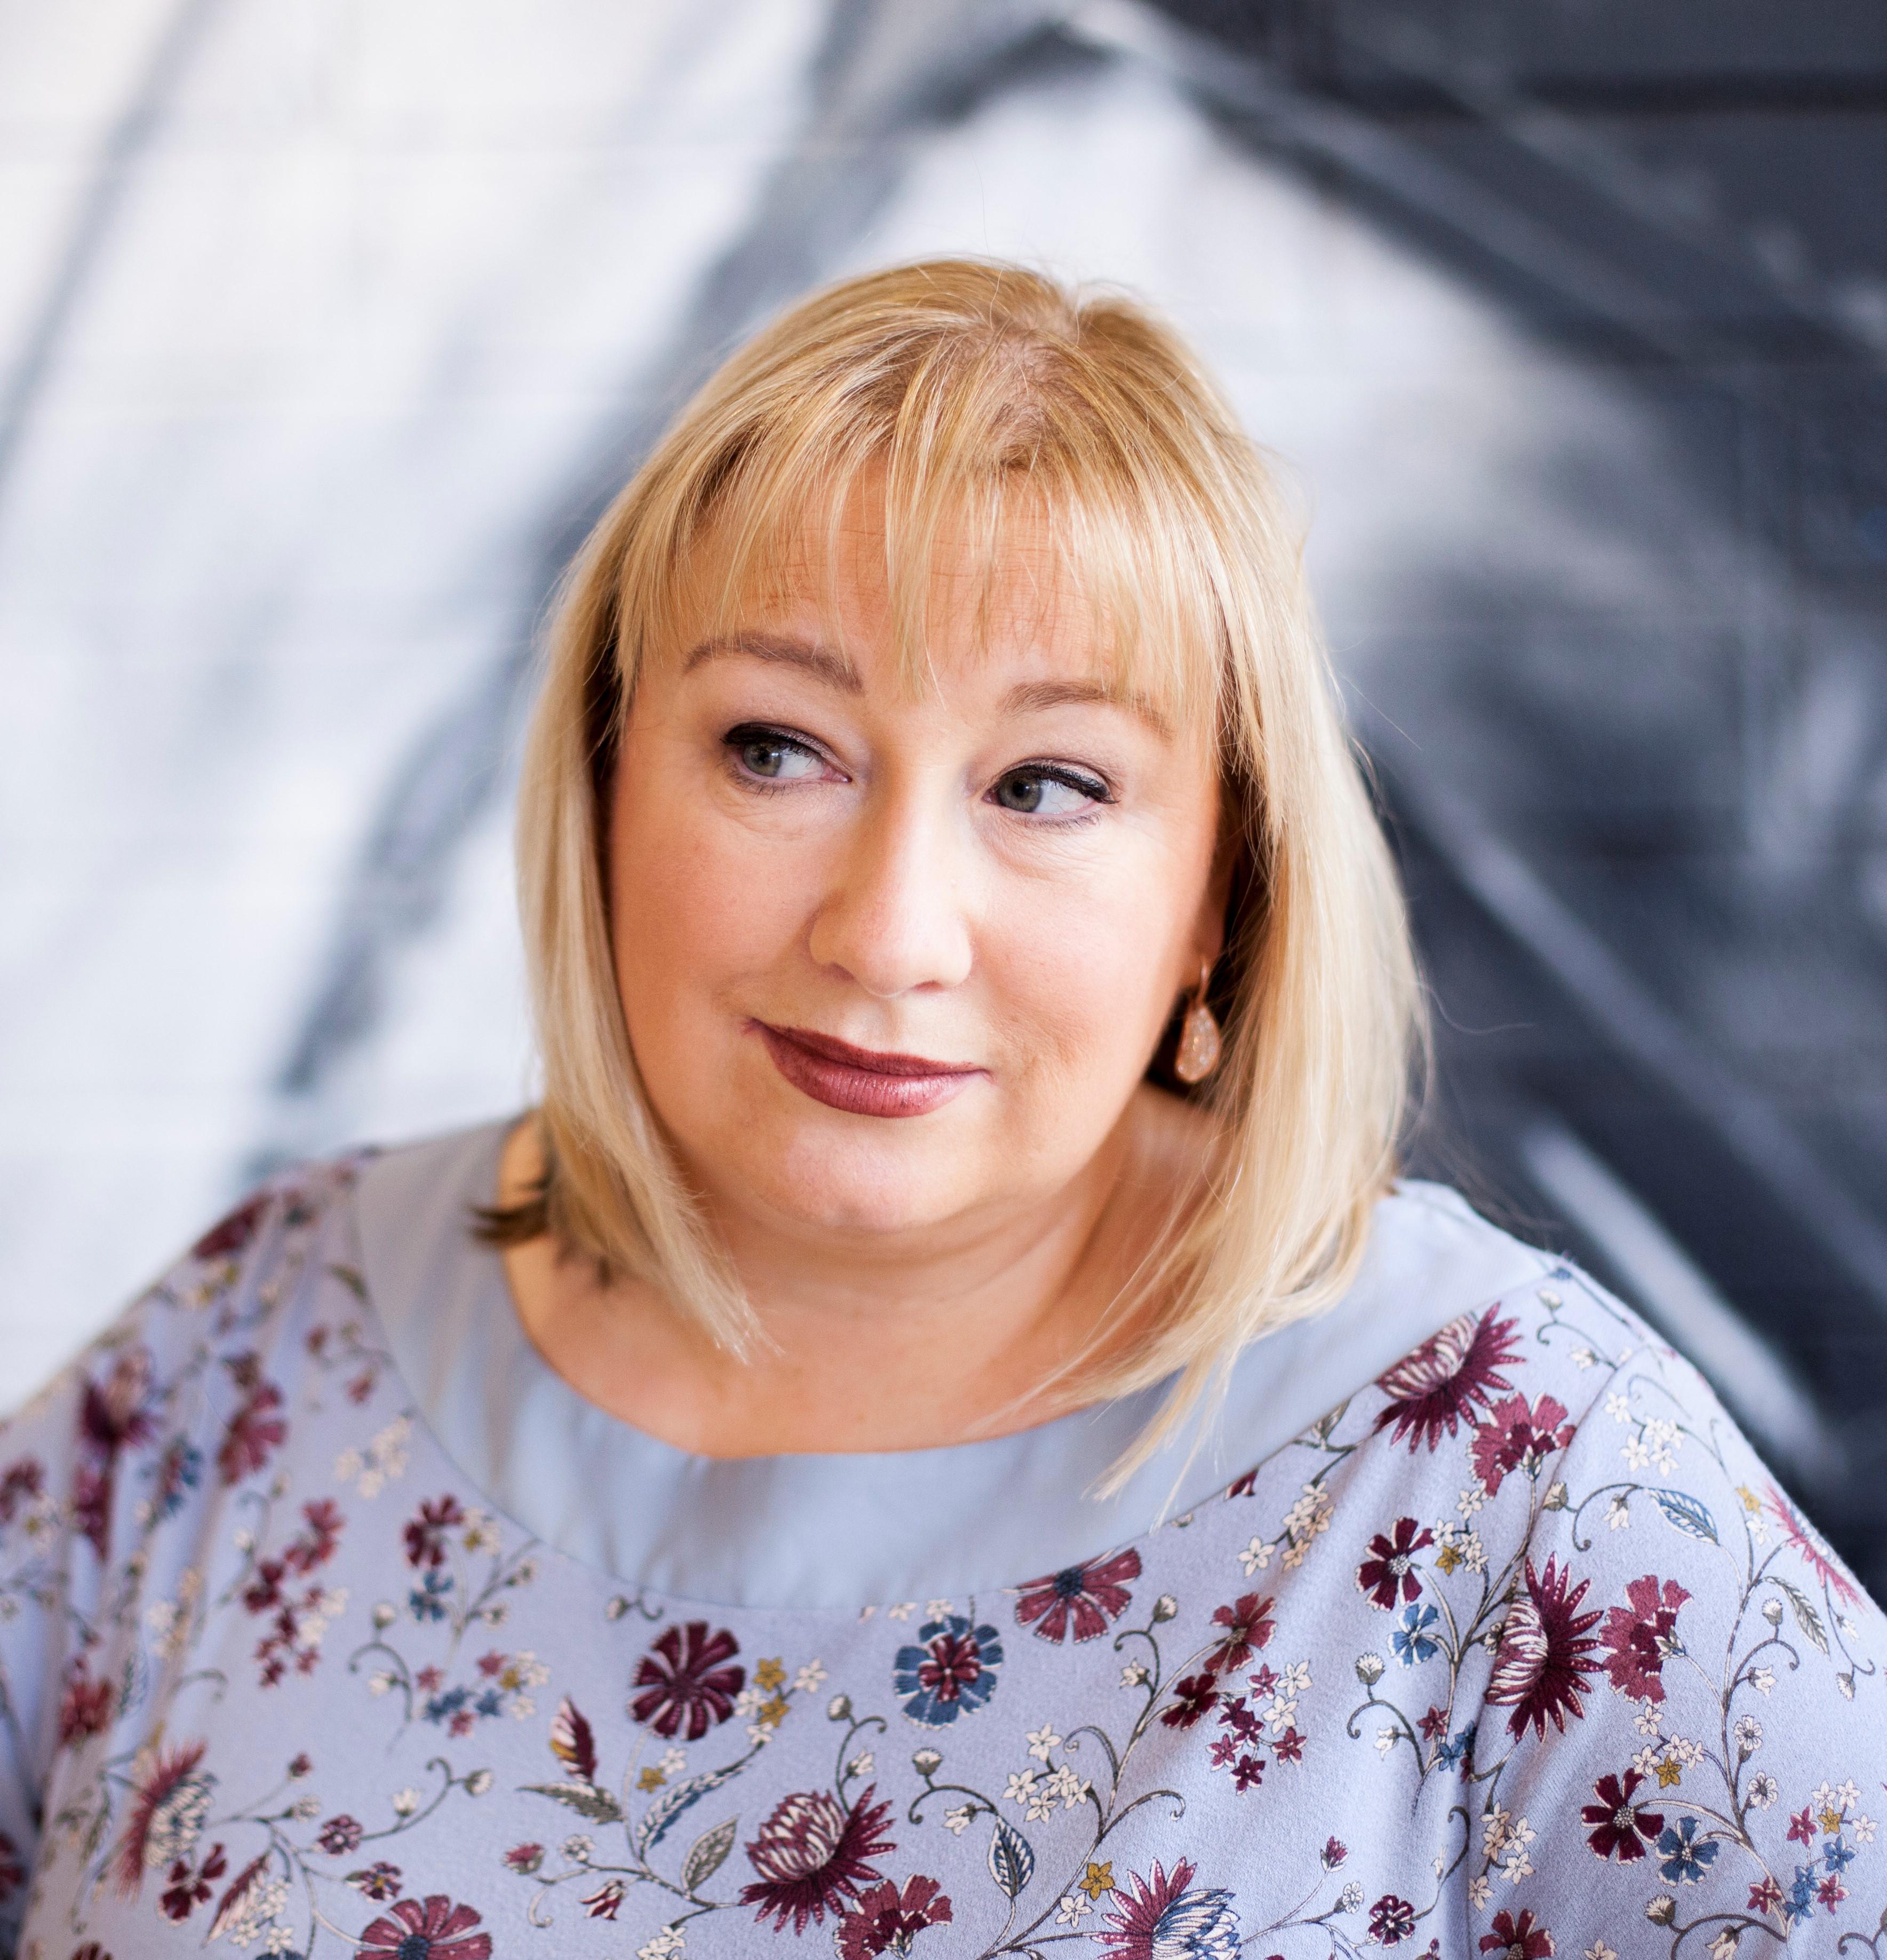 Women Of The Irish Food Industry – Aoife Ryan